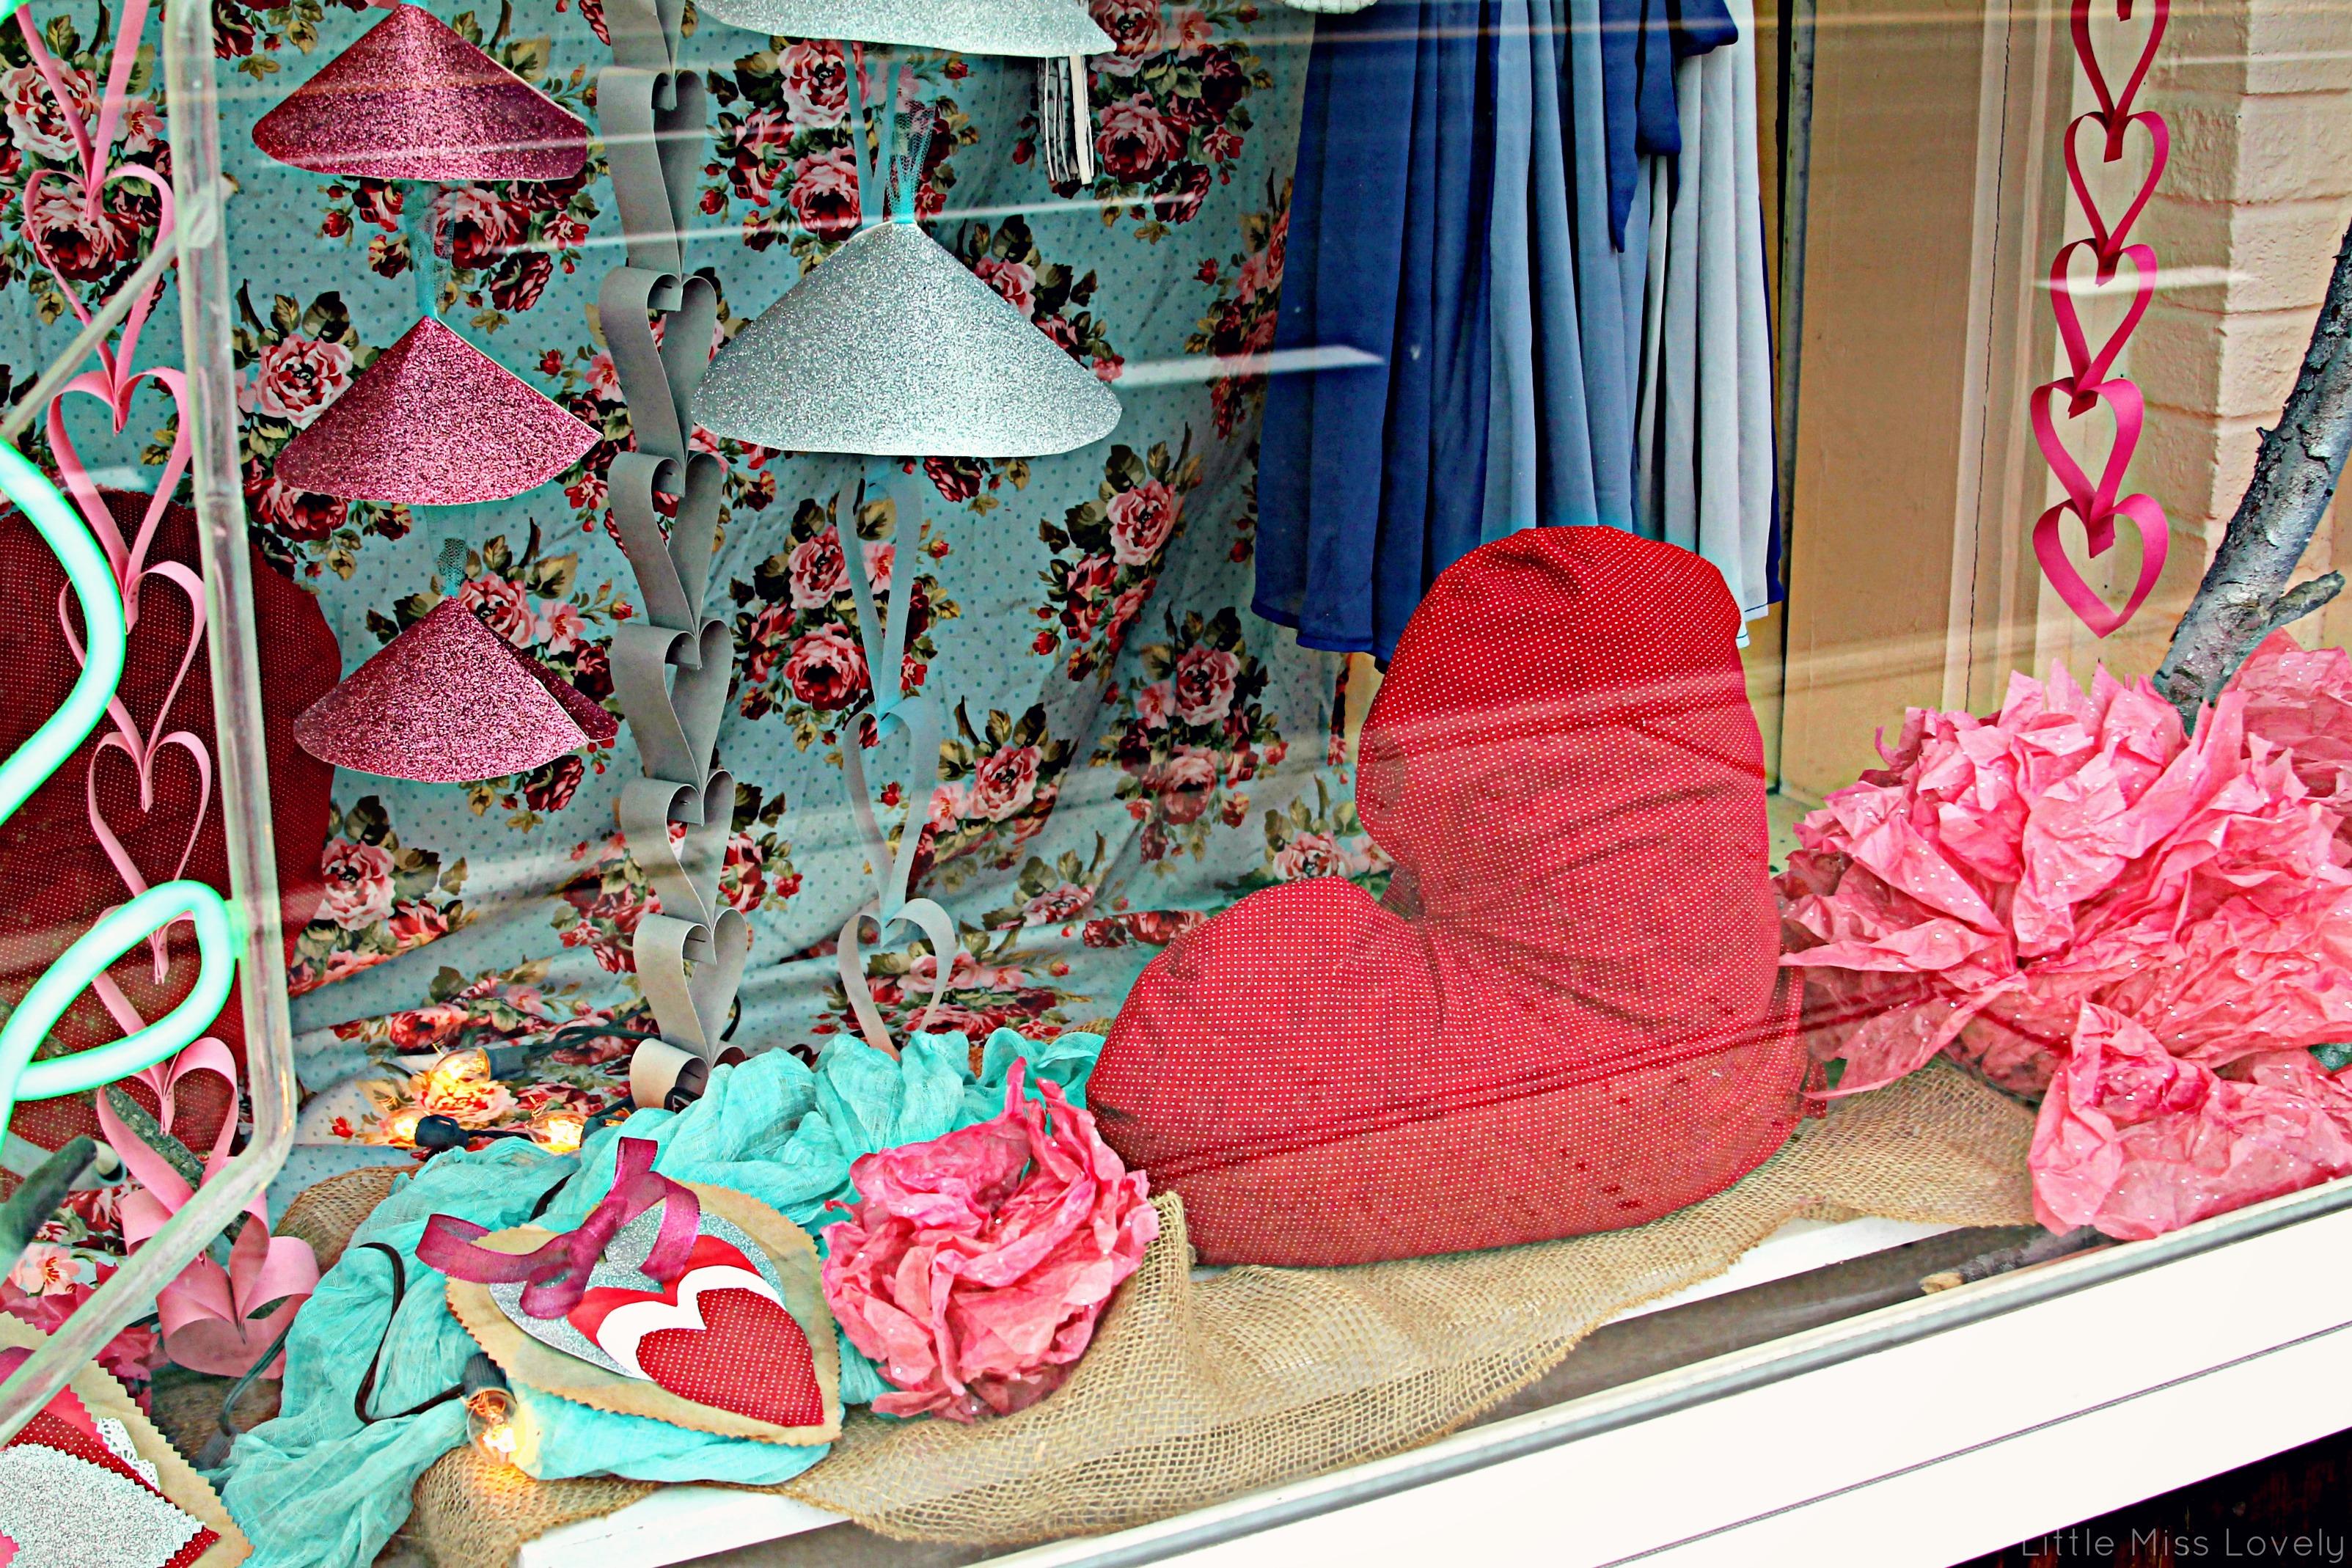 Little_Miss_Lovely_Window_Decorating_Design